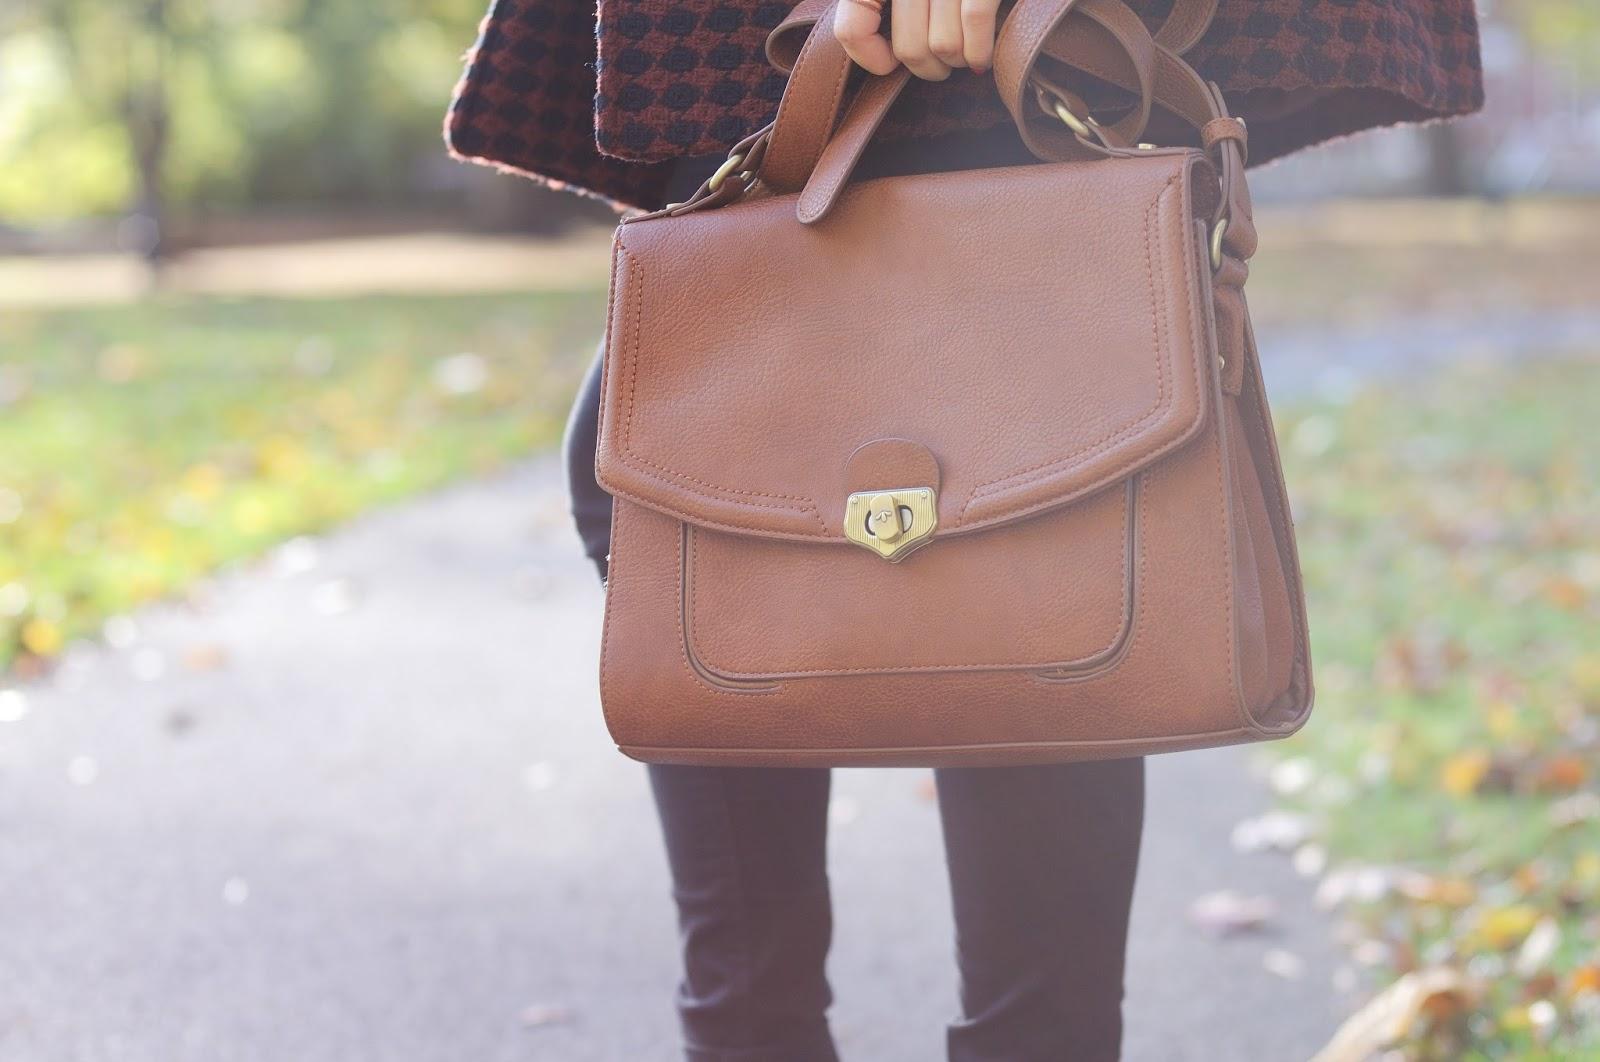 brown satchel, brown leather satchel